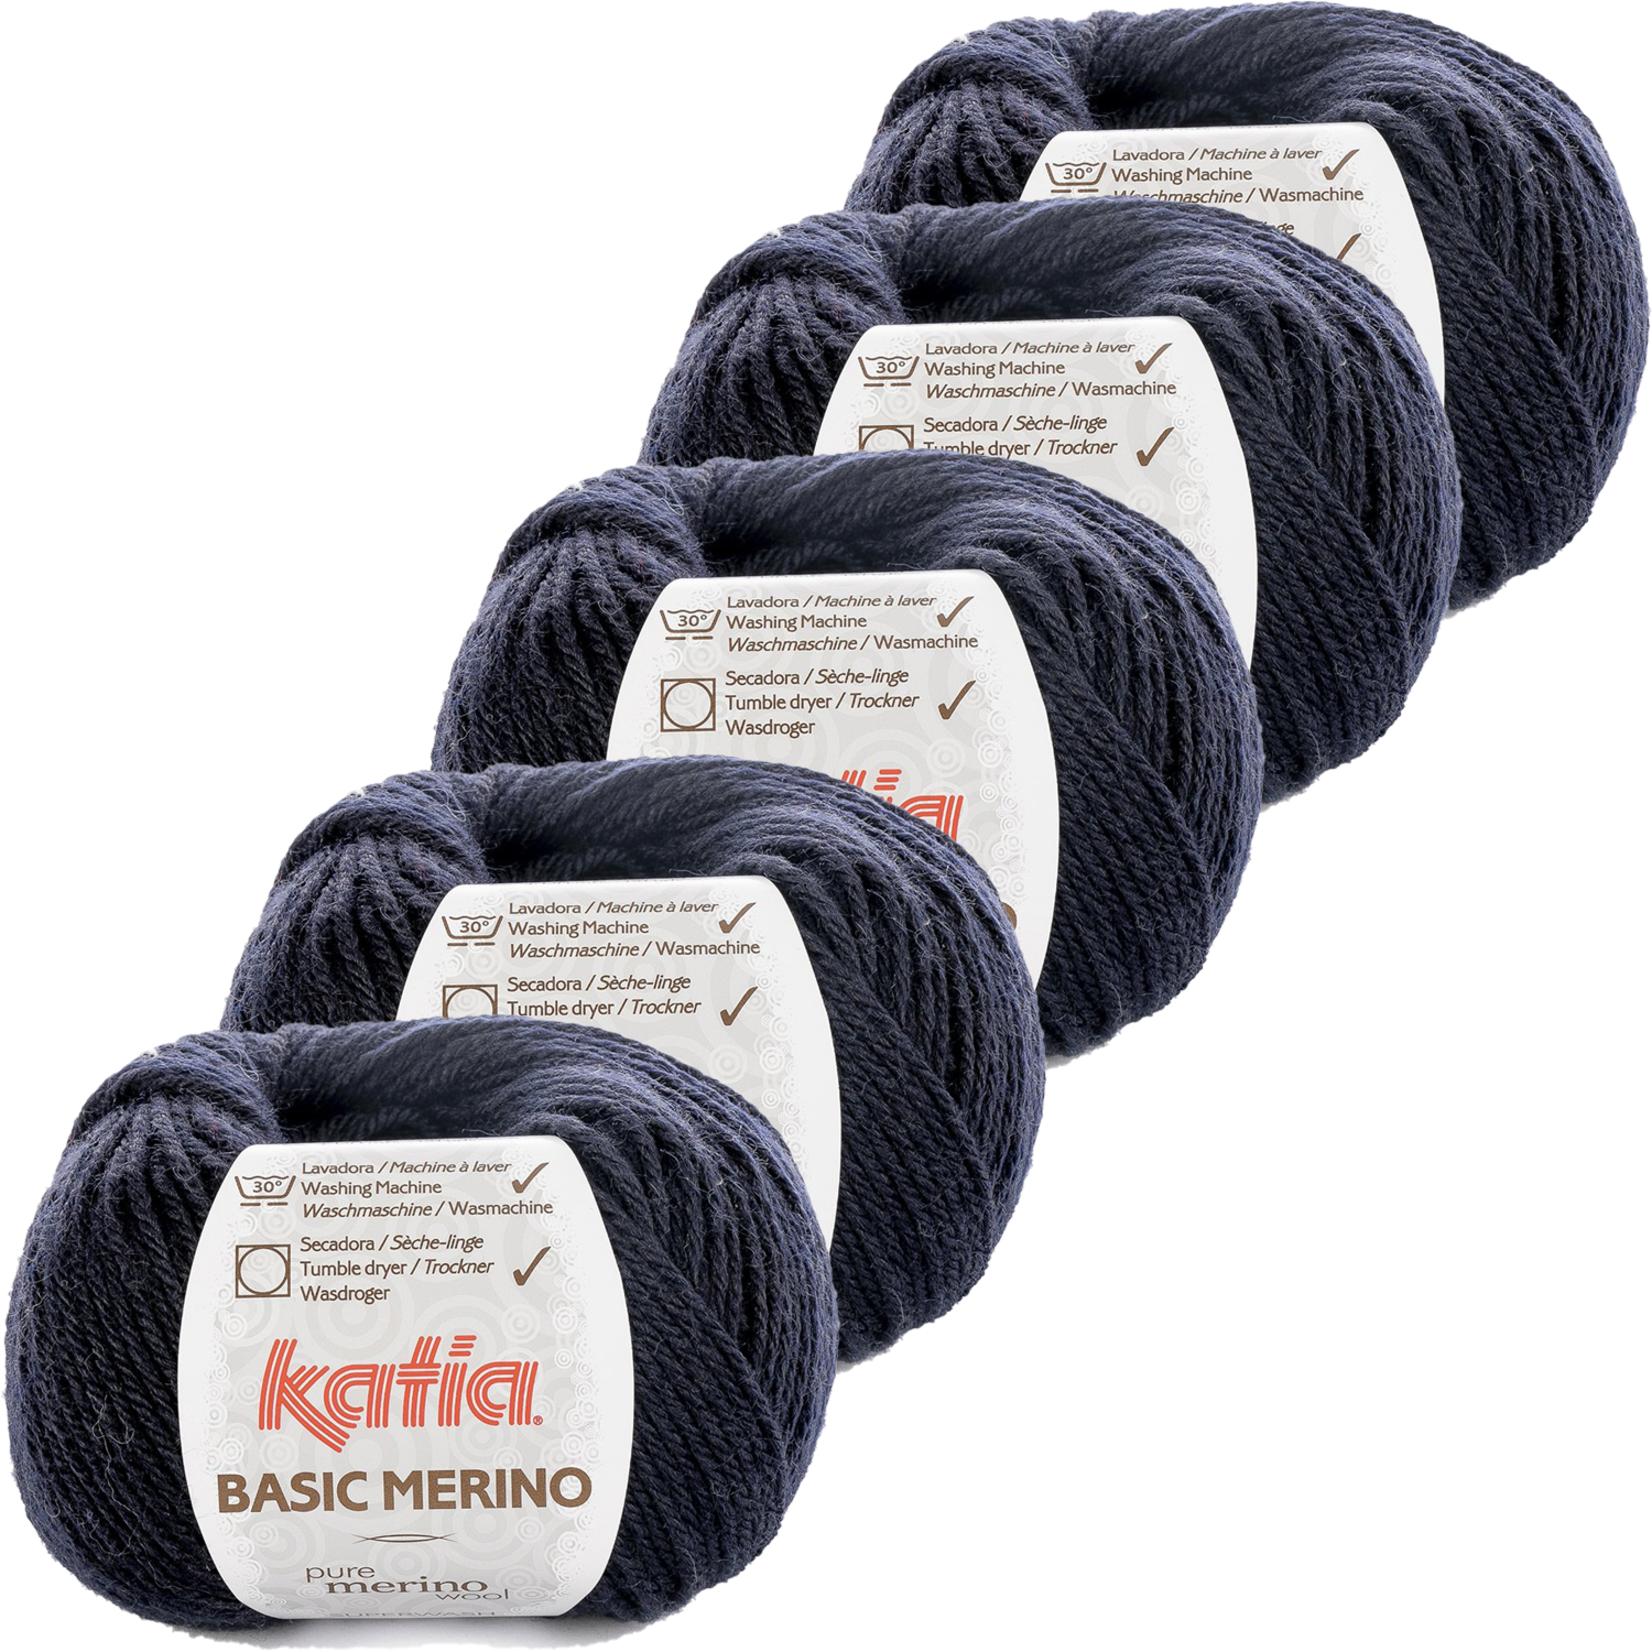 Katia Basic Merino - kleur 5_Zeer donker blauw - bundel 5 bollen 50 gr.  van 120 m.